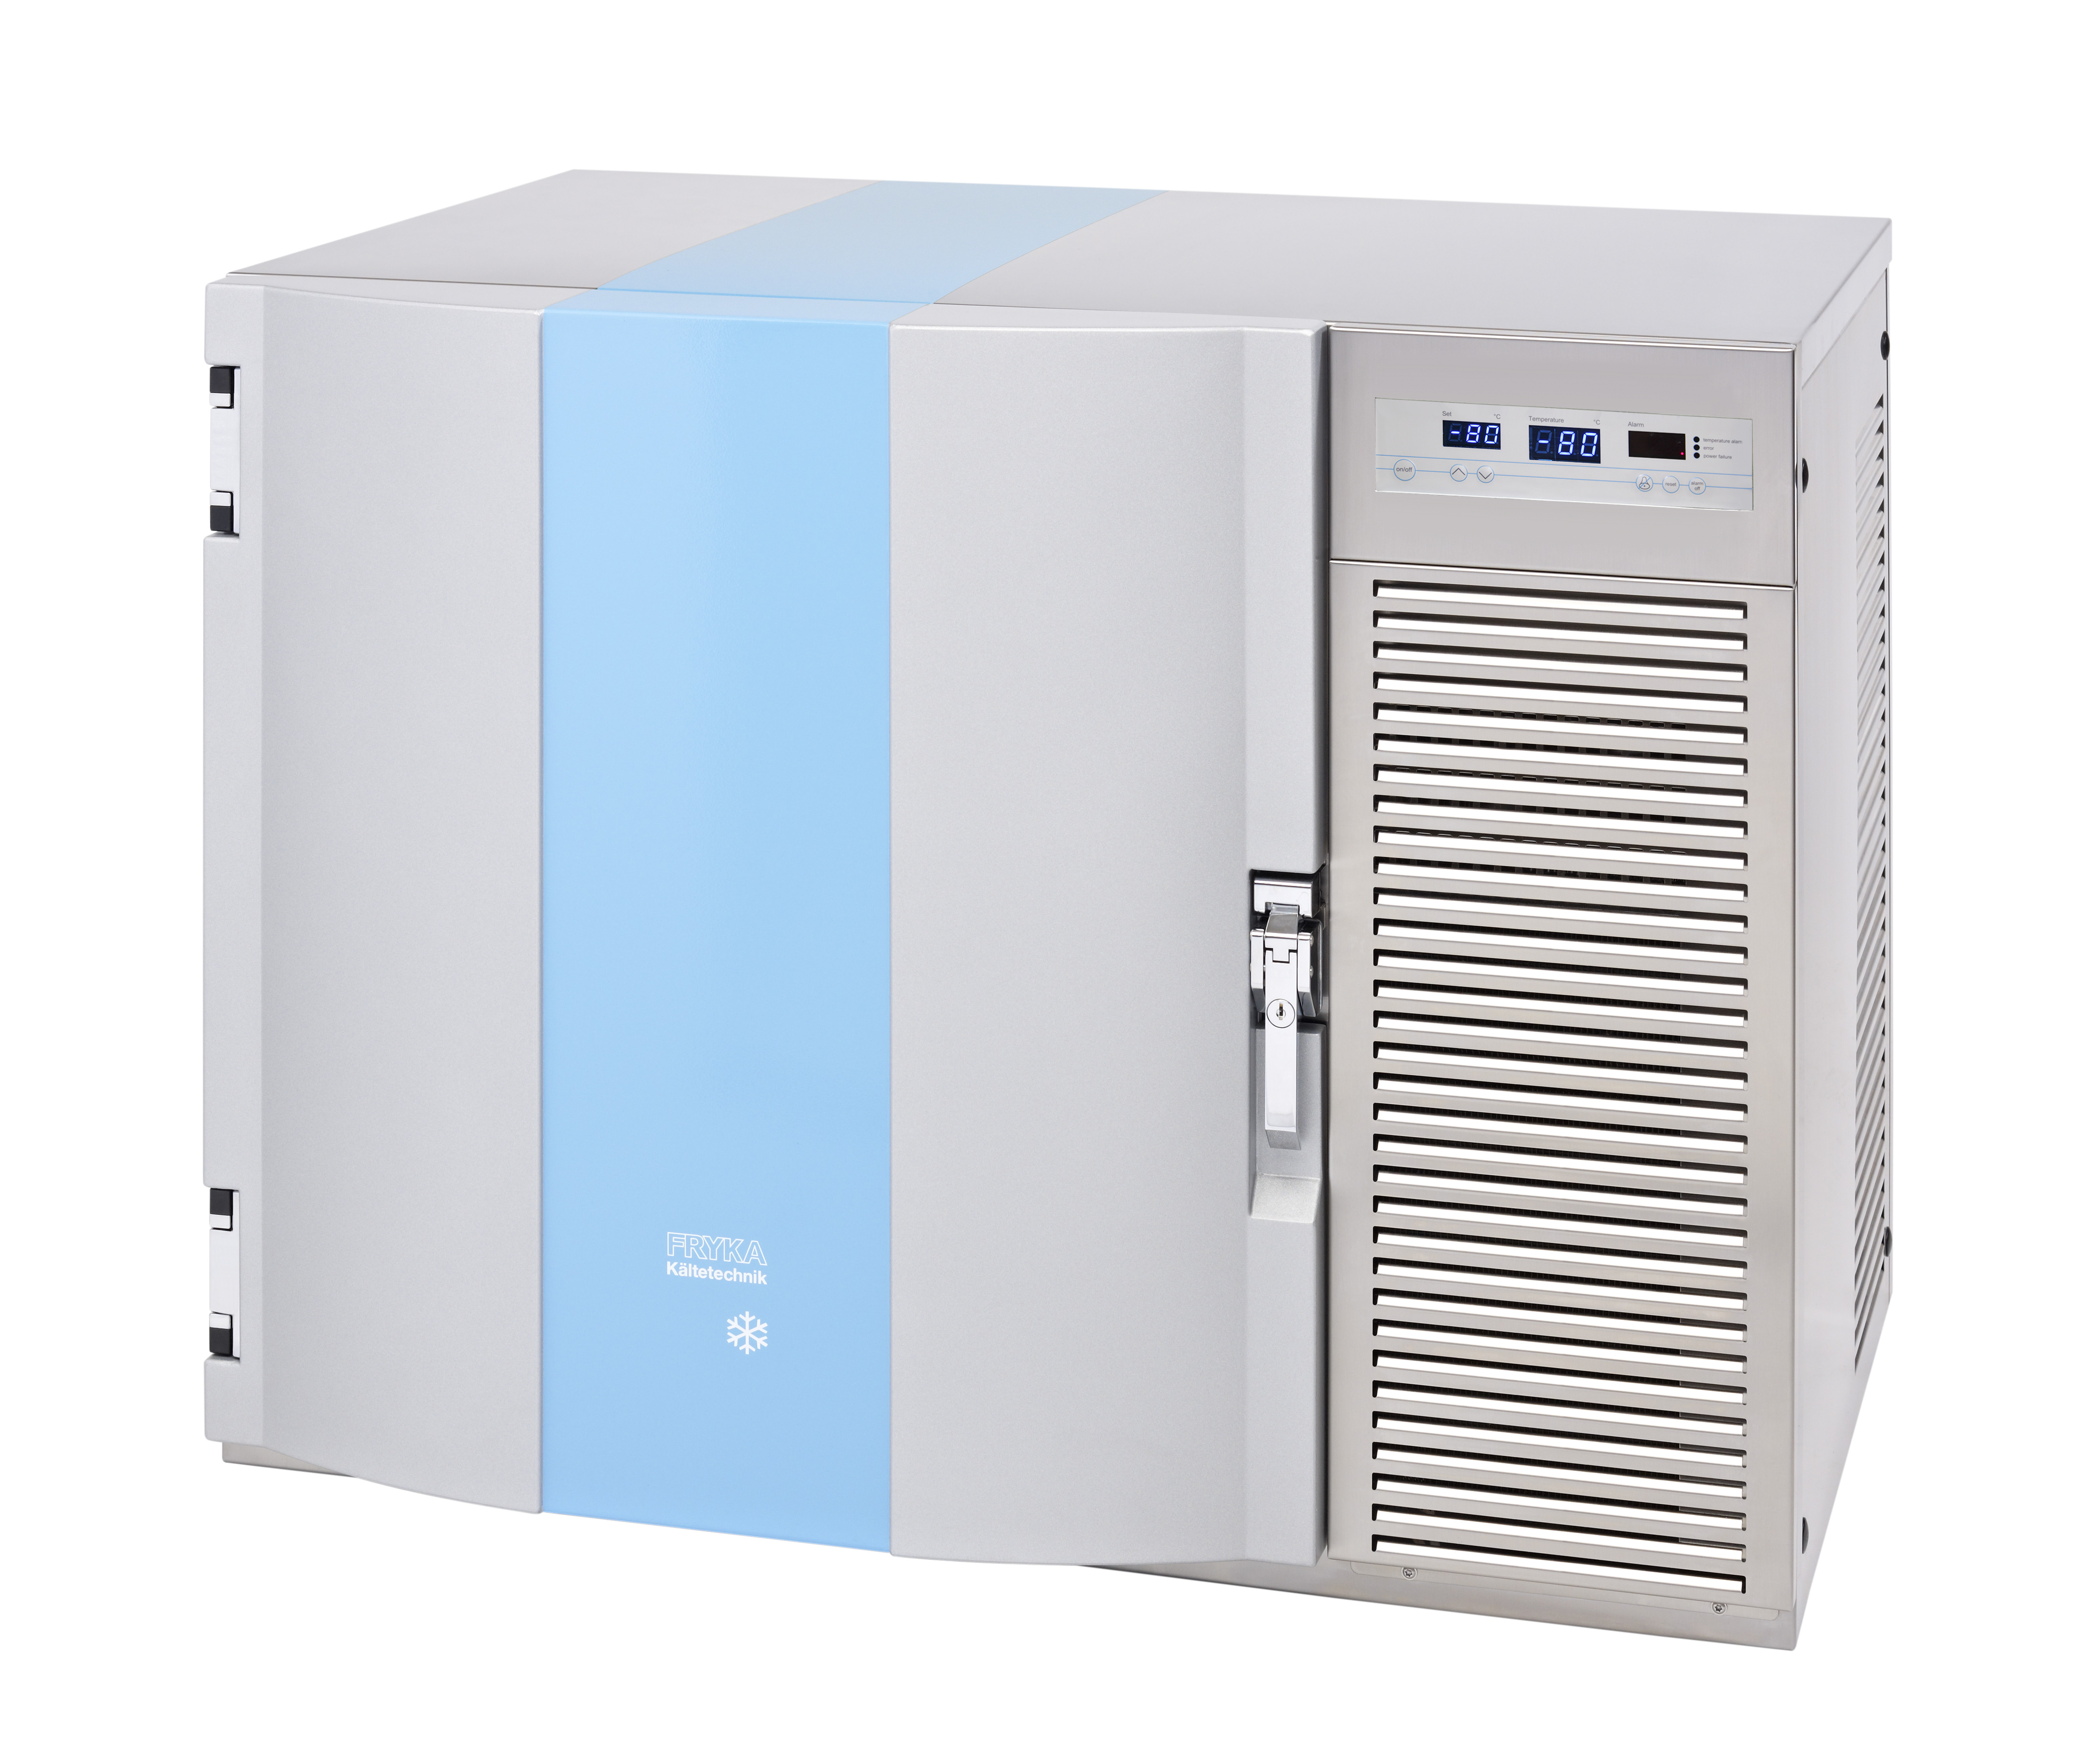 FRYKA Tiefkühlbox TUS 50-100 (-10°C bis -50°C)